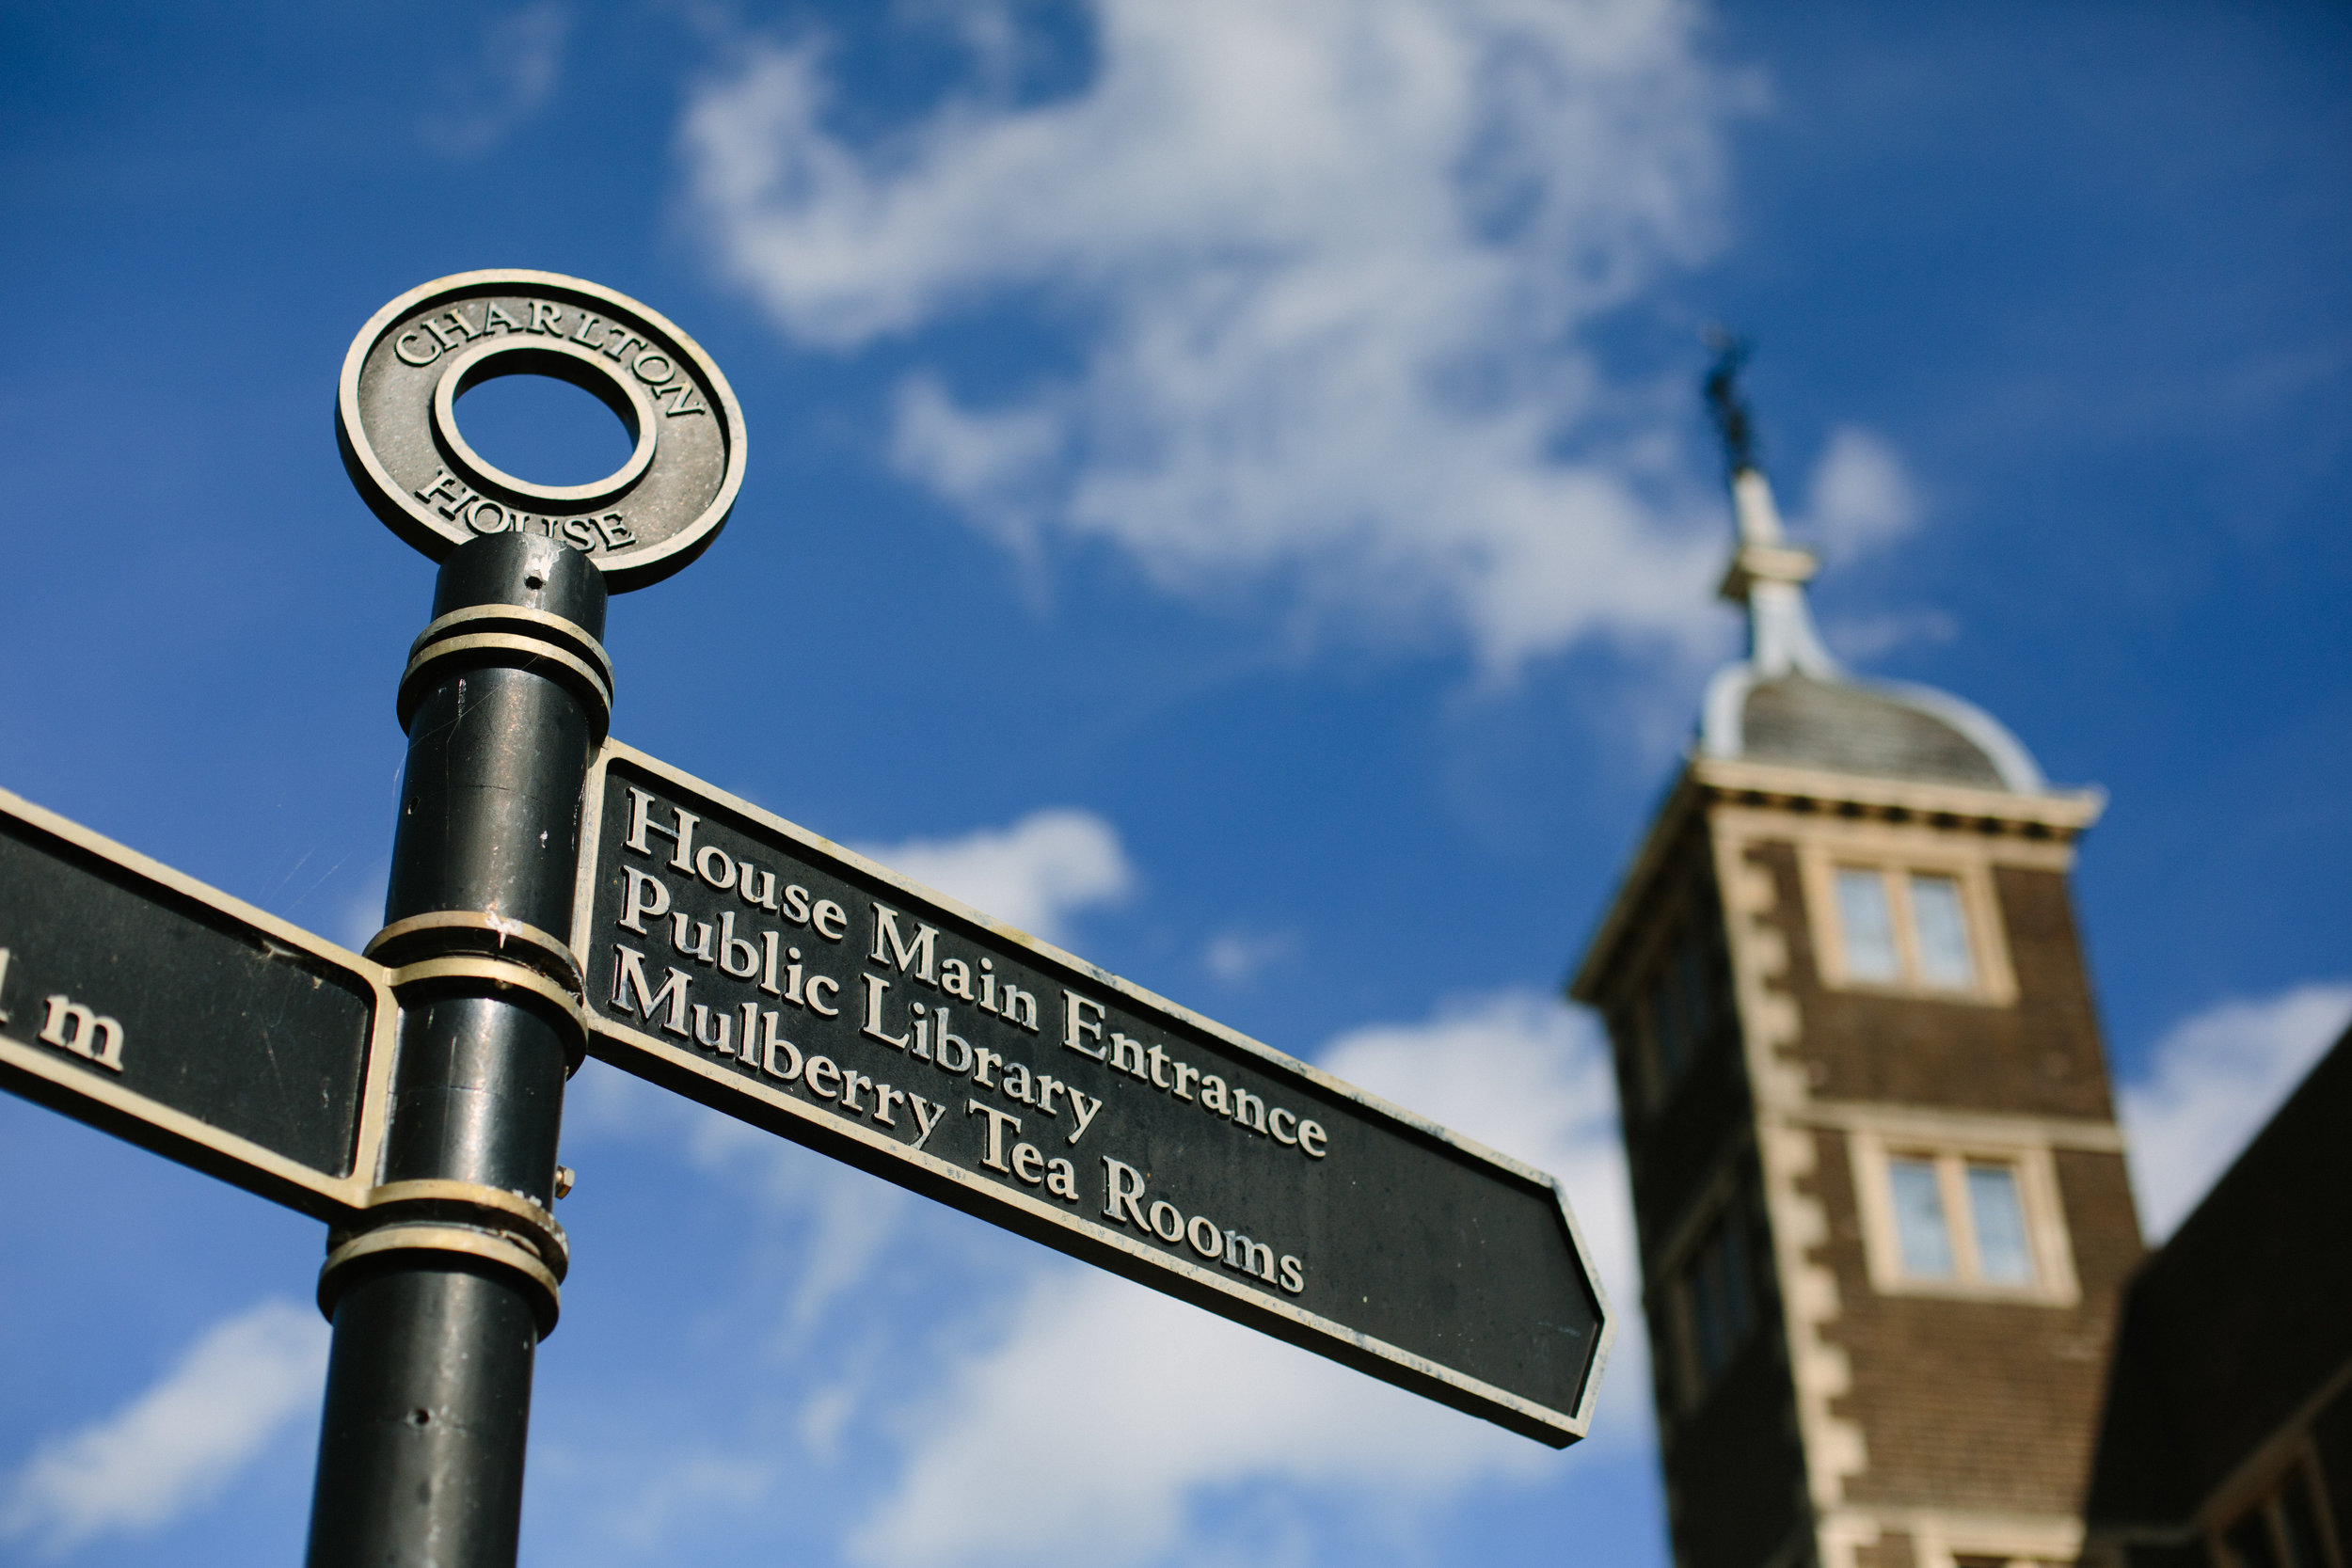 Saint-Alfege-Church-greenwich-wedding-charlton-house-reception-240